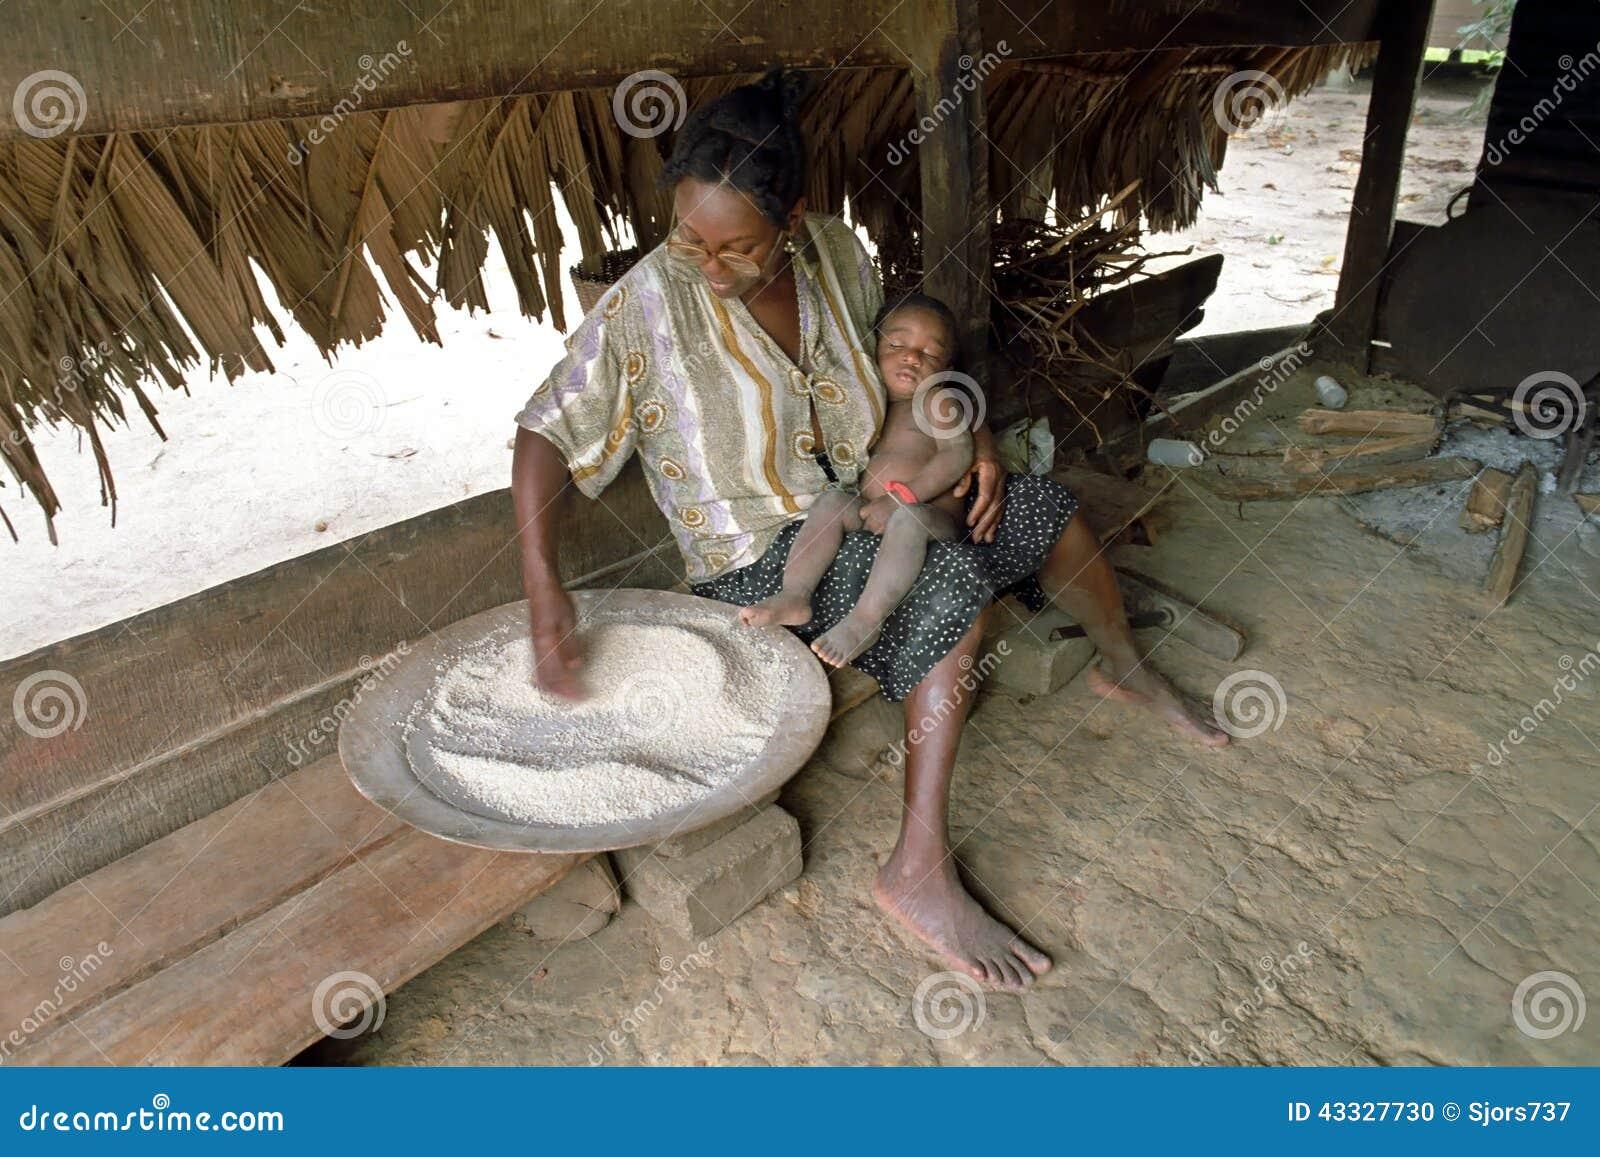 Village Life Of Maroons In Santigron Surinam Editorial